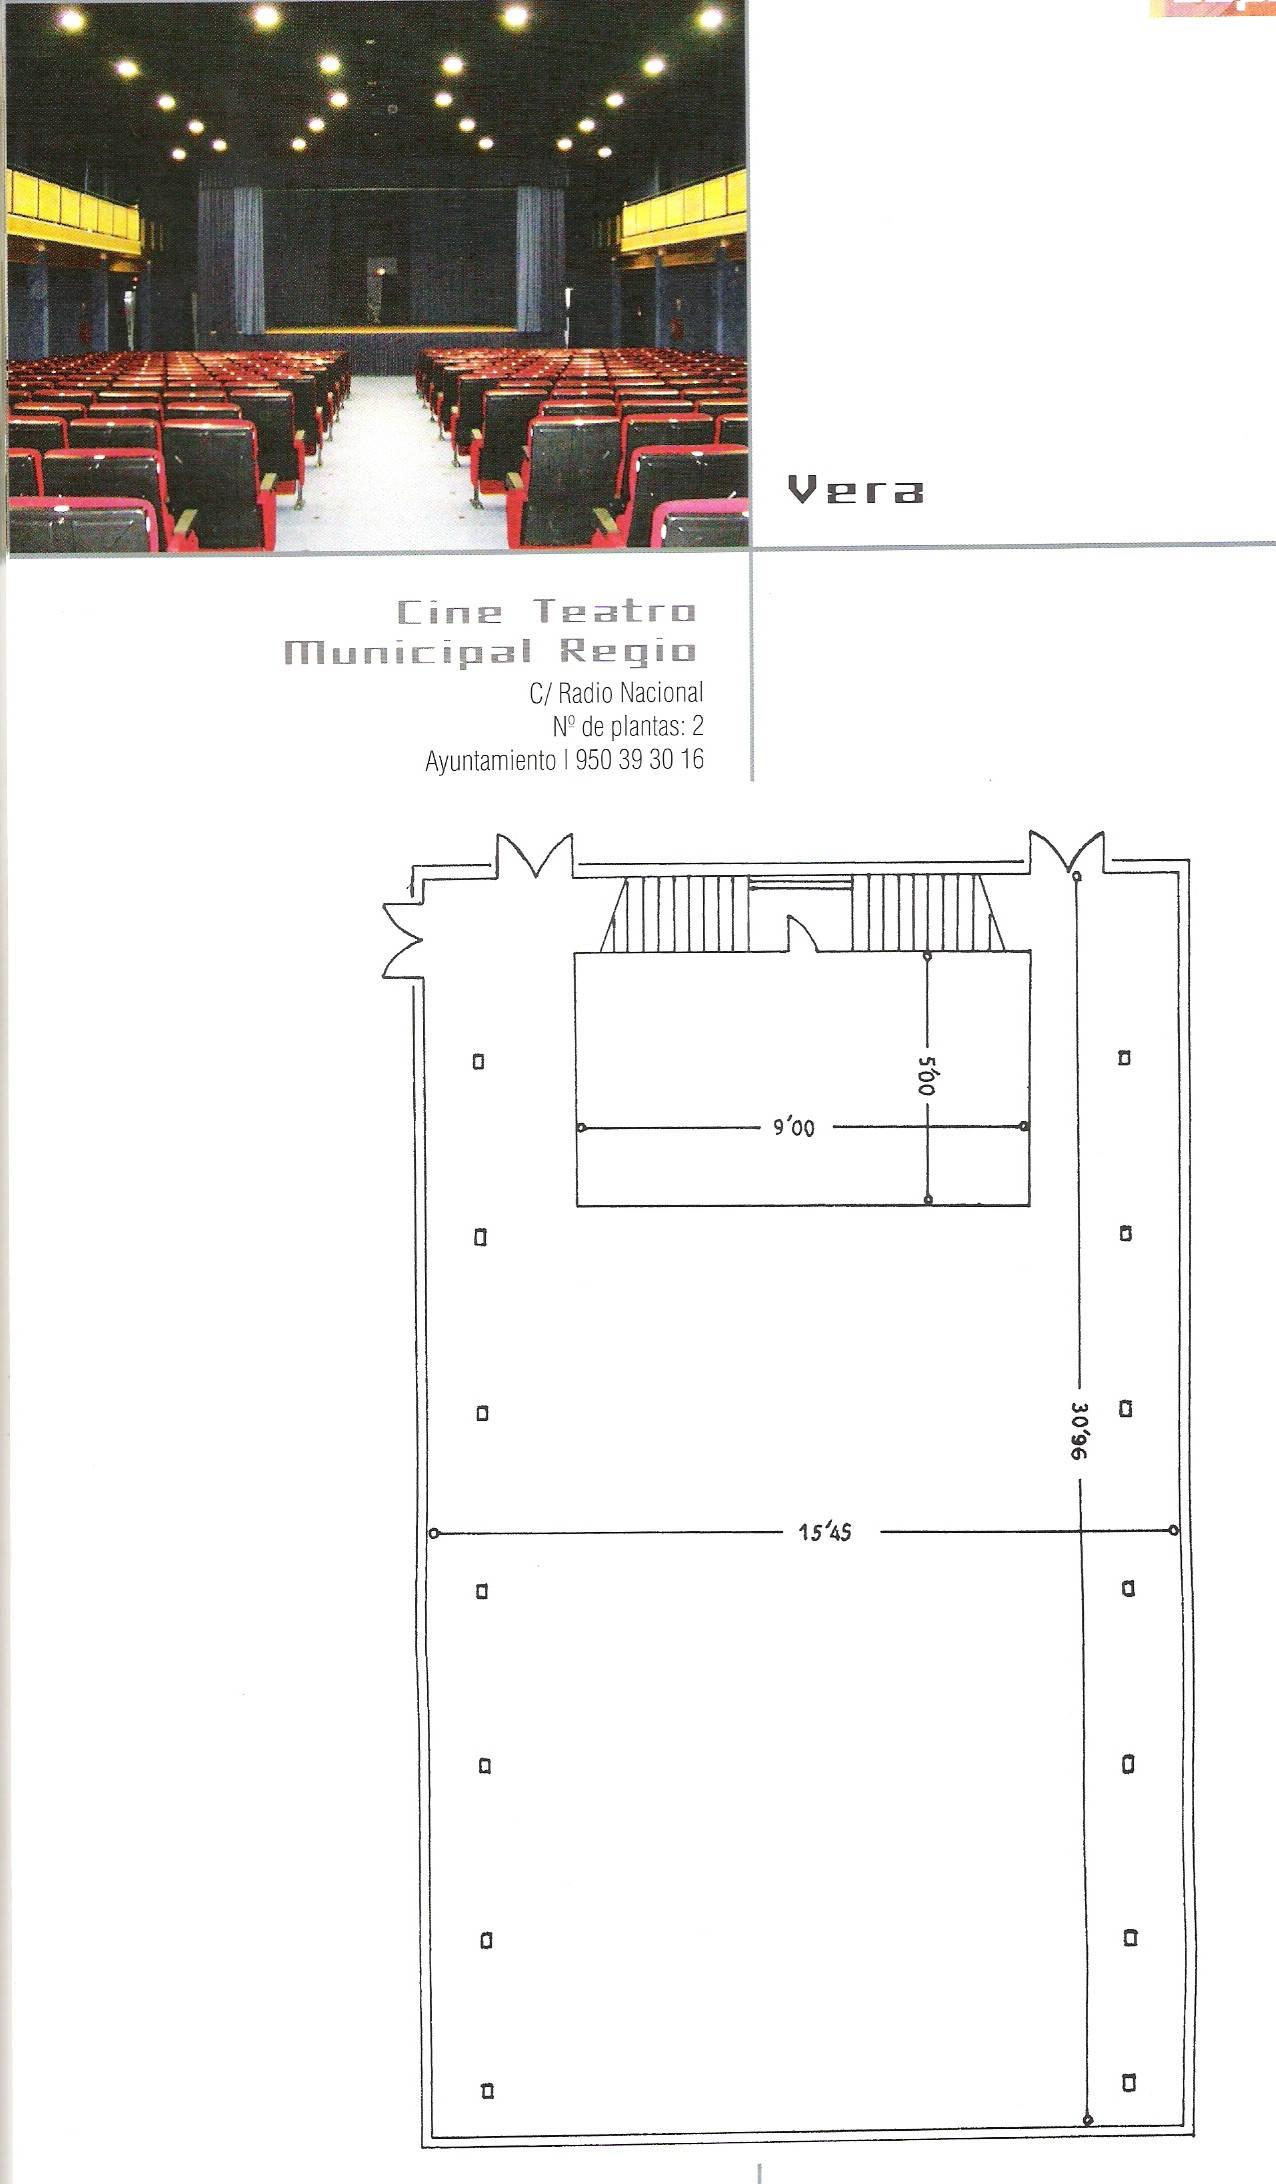 Auditorio Municipal de Vera